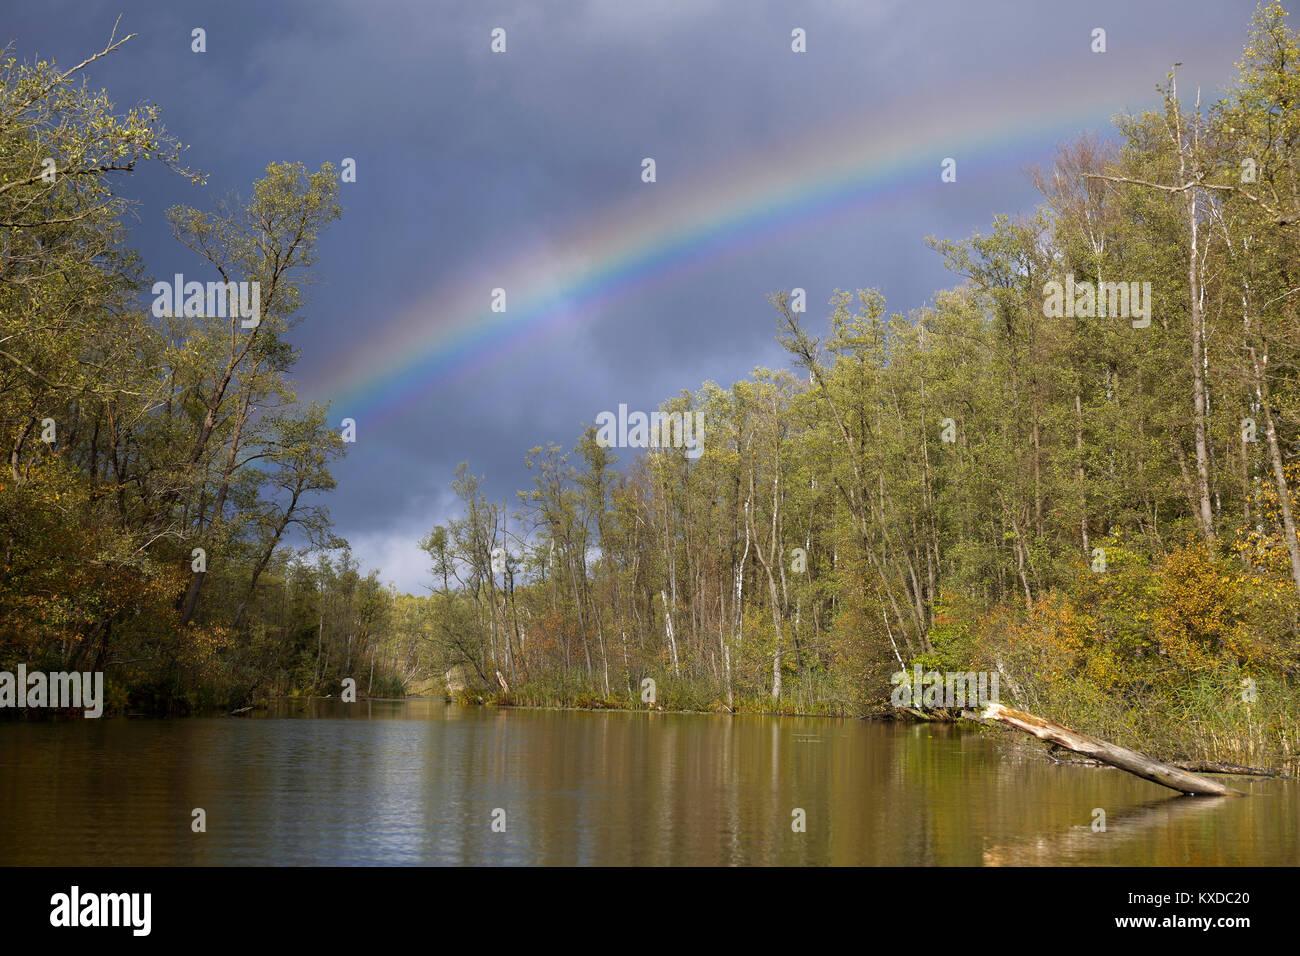 Erlenbruchwald forest with rainbow, Mecklenburg Lake District, Mecklenburg-Western Pomerania, Germany - Stock Image